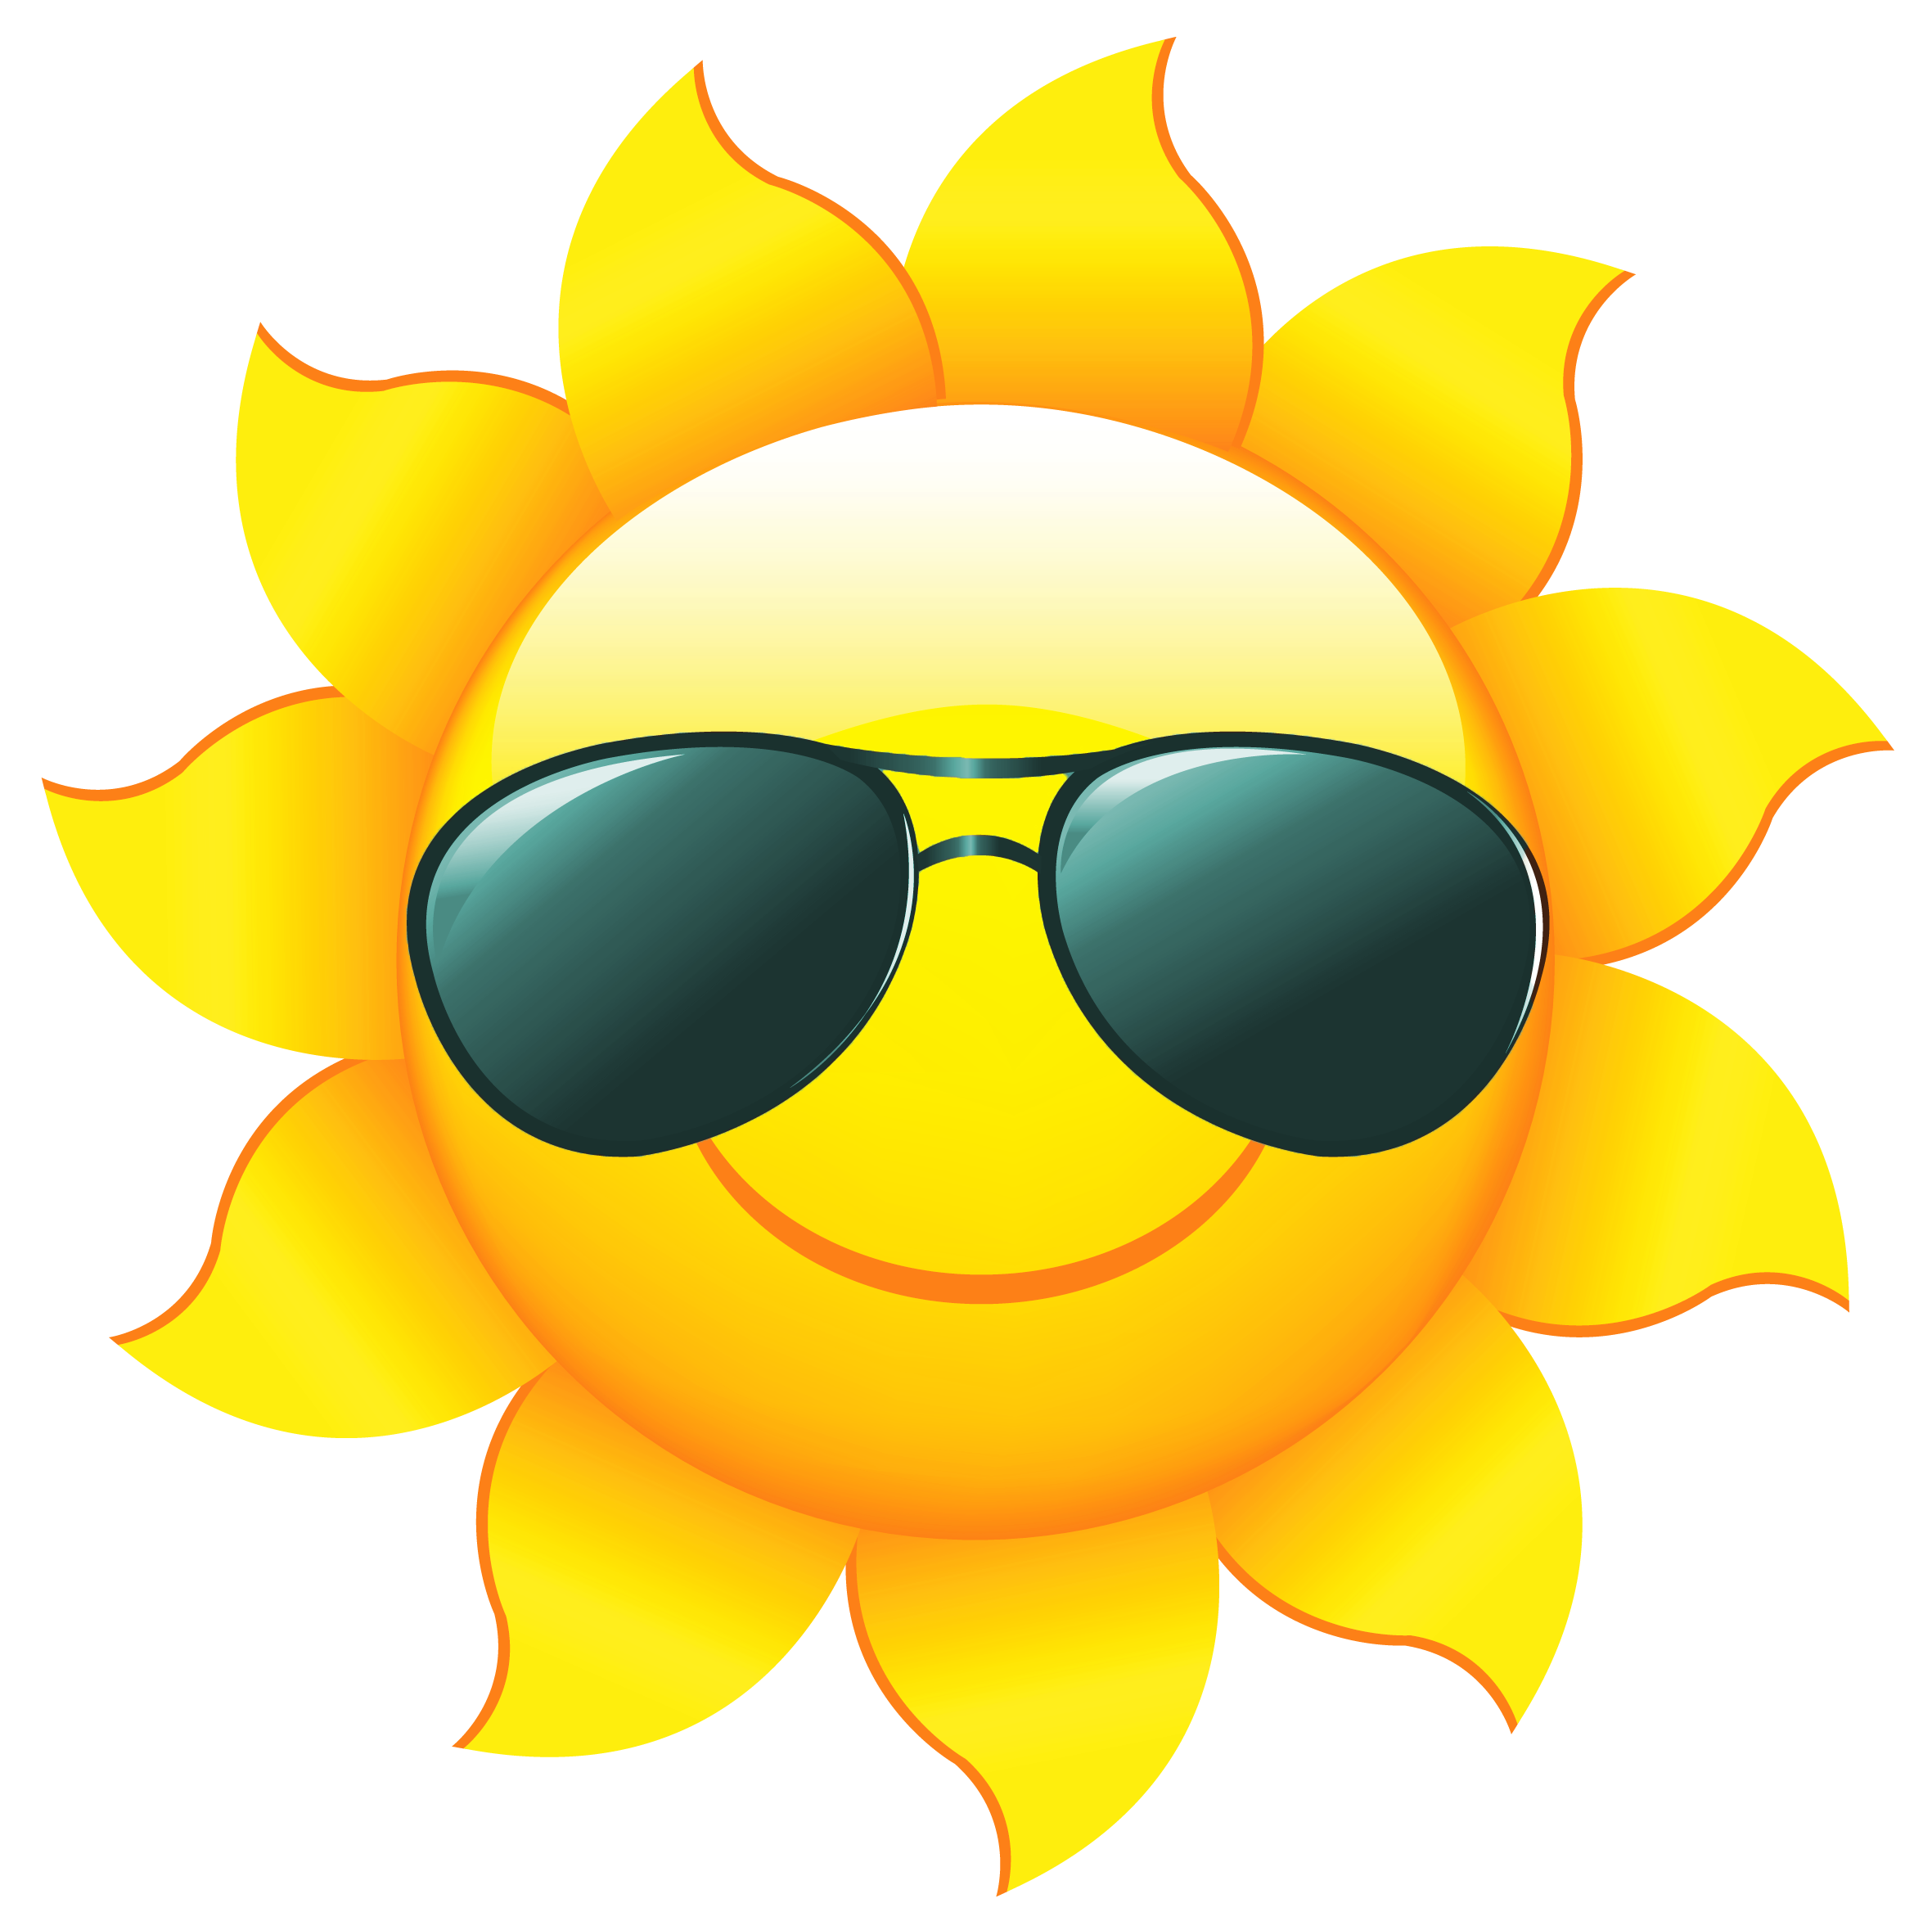 Sunshine sun clip art with transparent background free